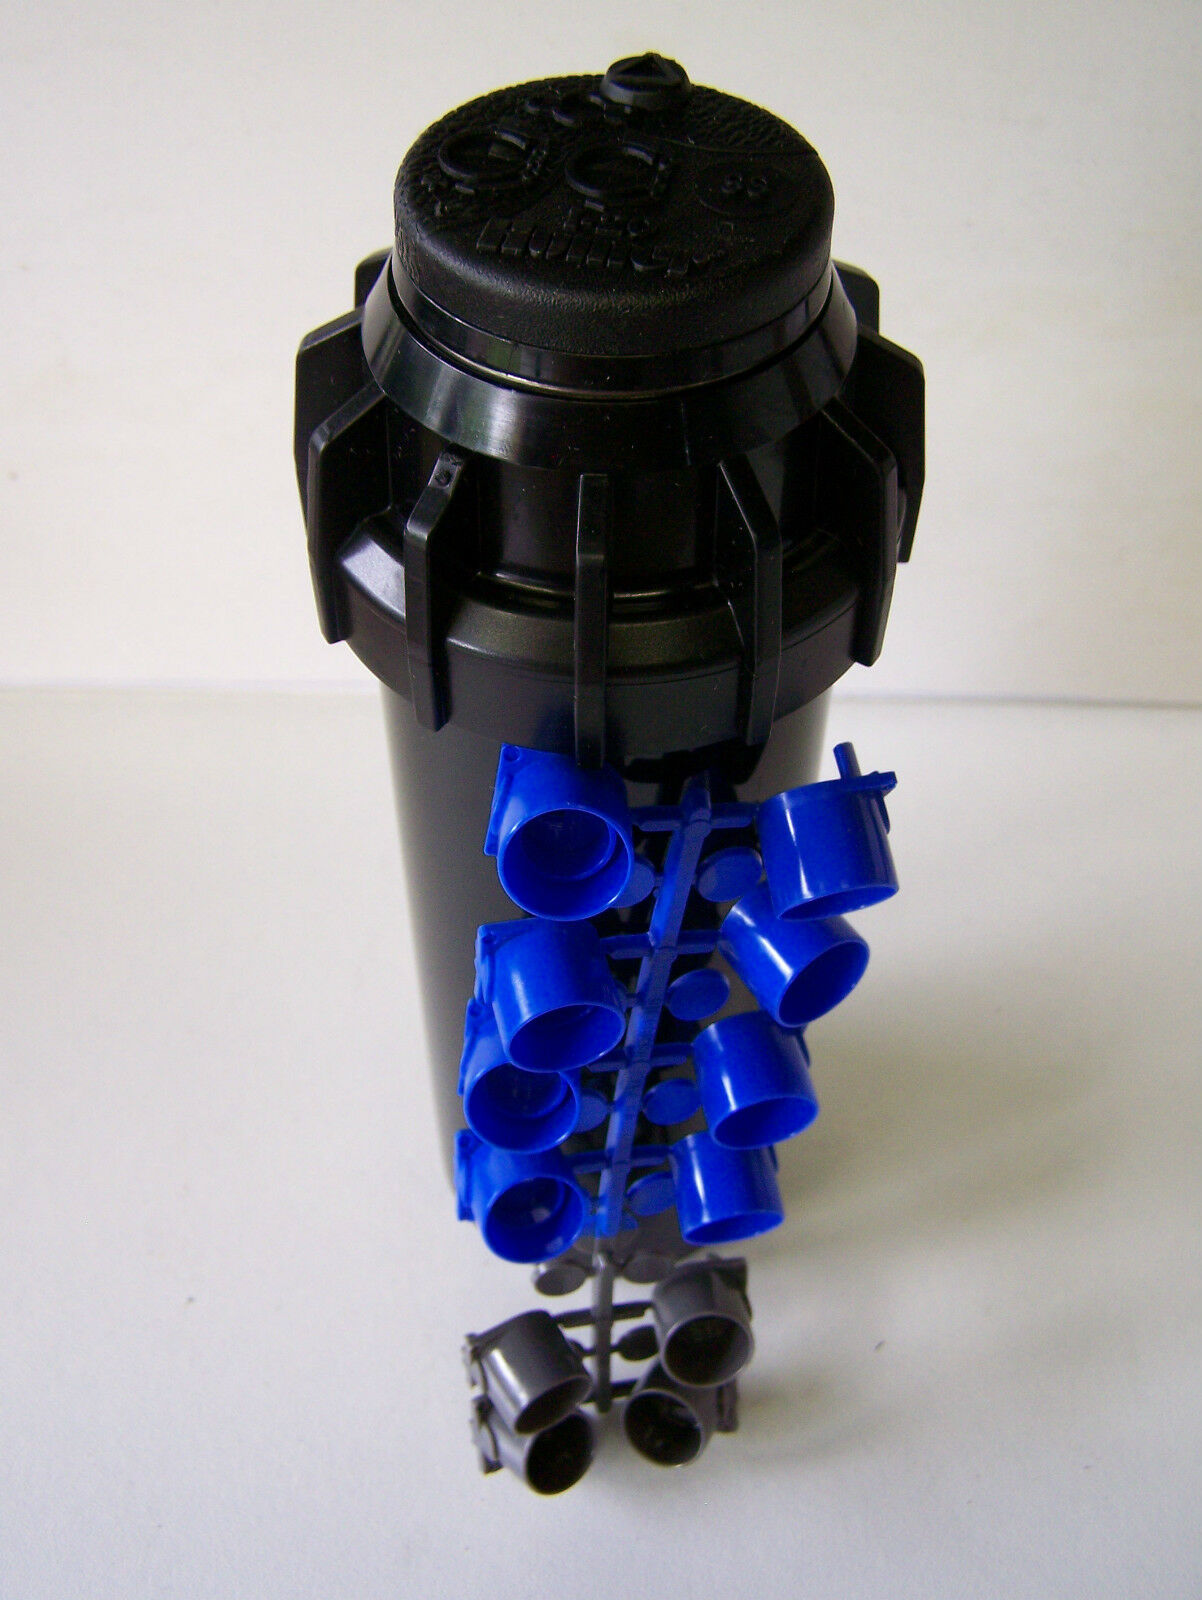 Getrieberegner Versenkregner Edelstahl Sprenger Sprenger Sprenger Regner Hunter I-20-04 o. I-25-04 | Modern  | Hochwertige Materialien  | Gewinnen Sie das Lob der Kunden  d4453b